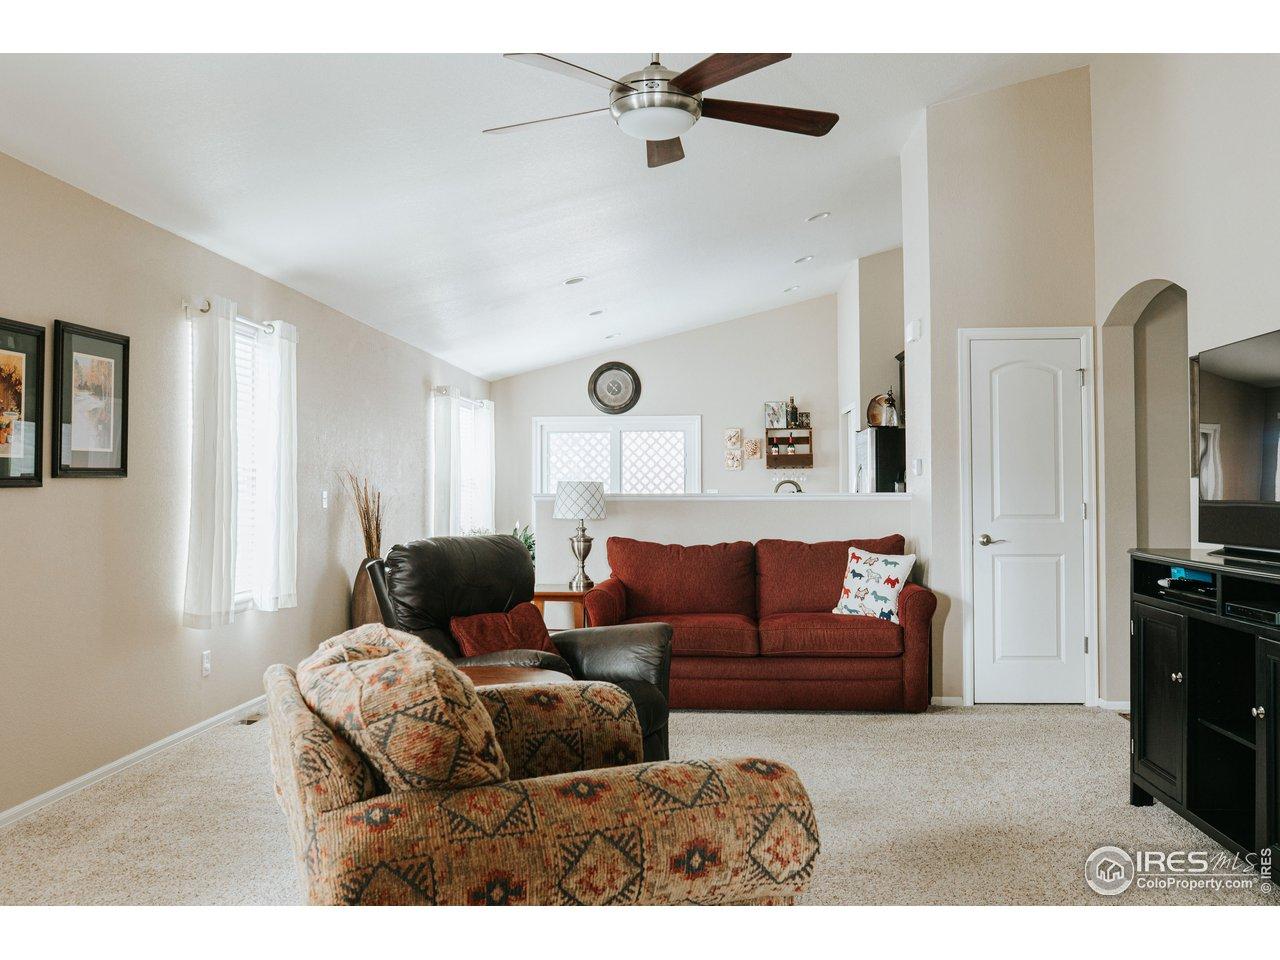 Open floor plan & high ceilings